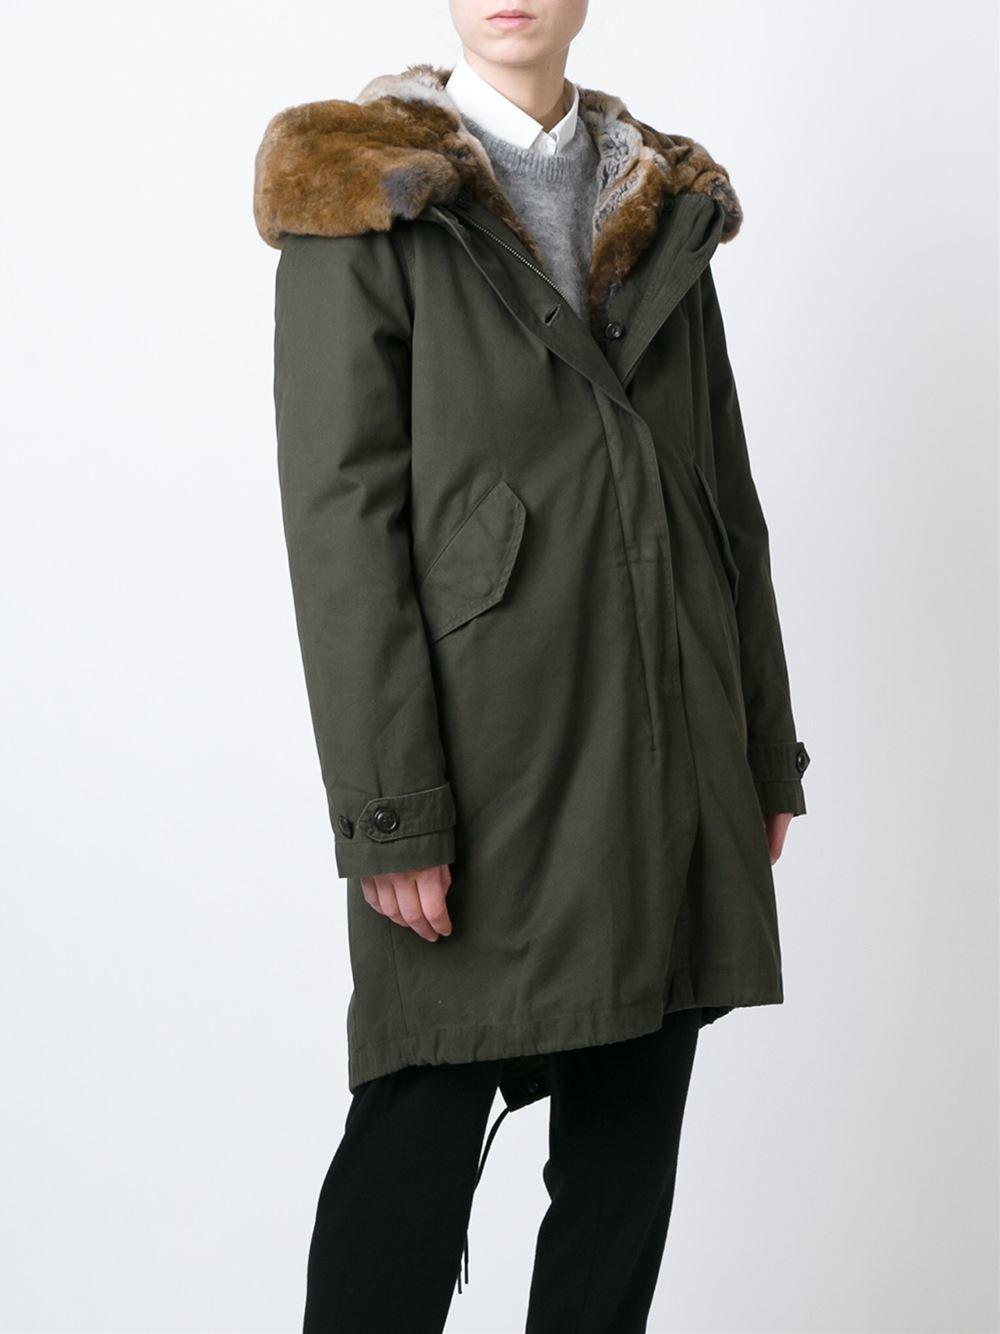 Woolrich Fur Lined Parka